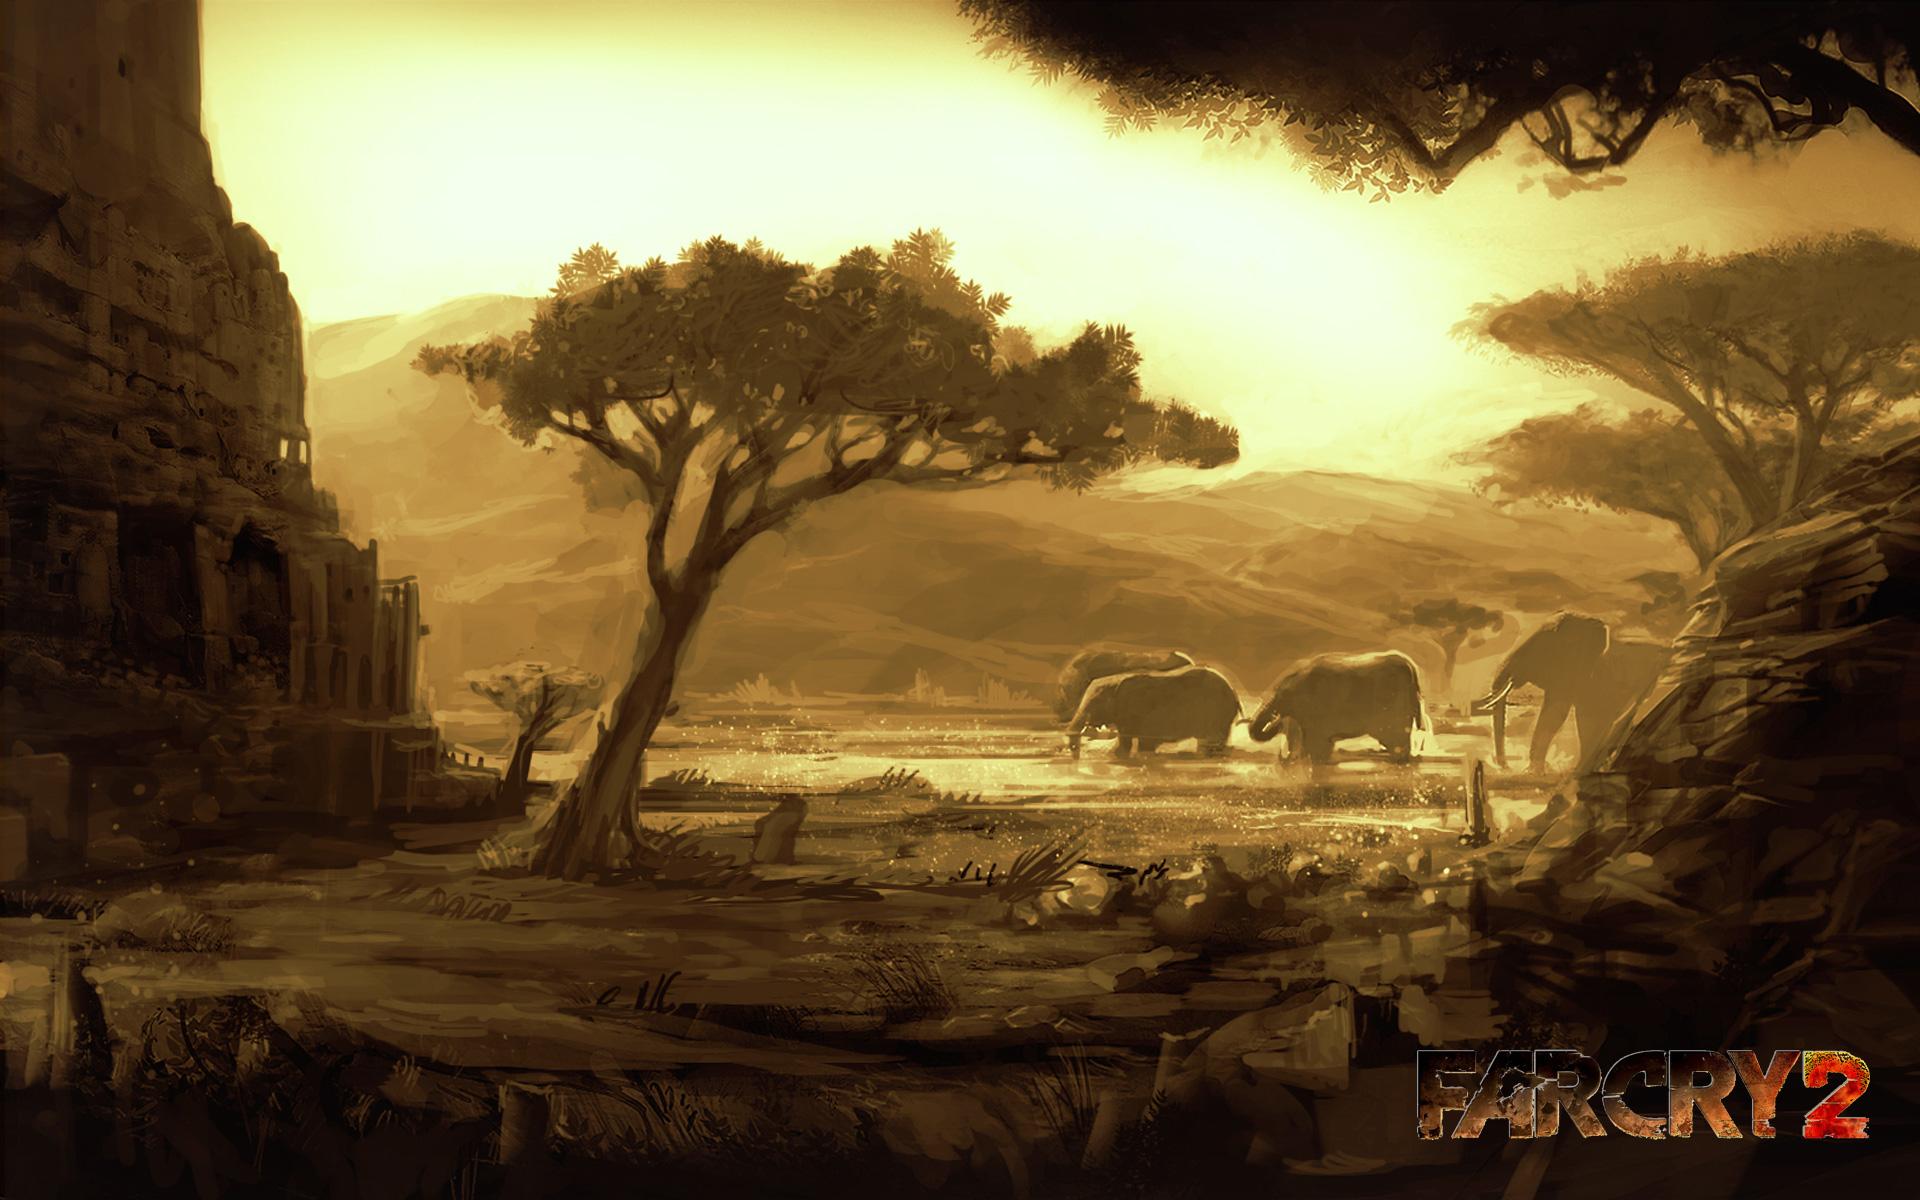 Far Cry 2 Wallpaper in 1920x1200